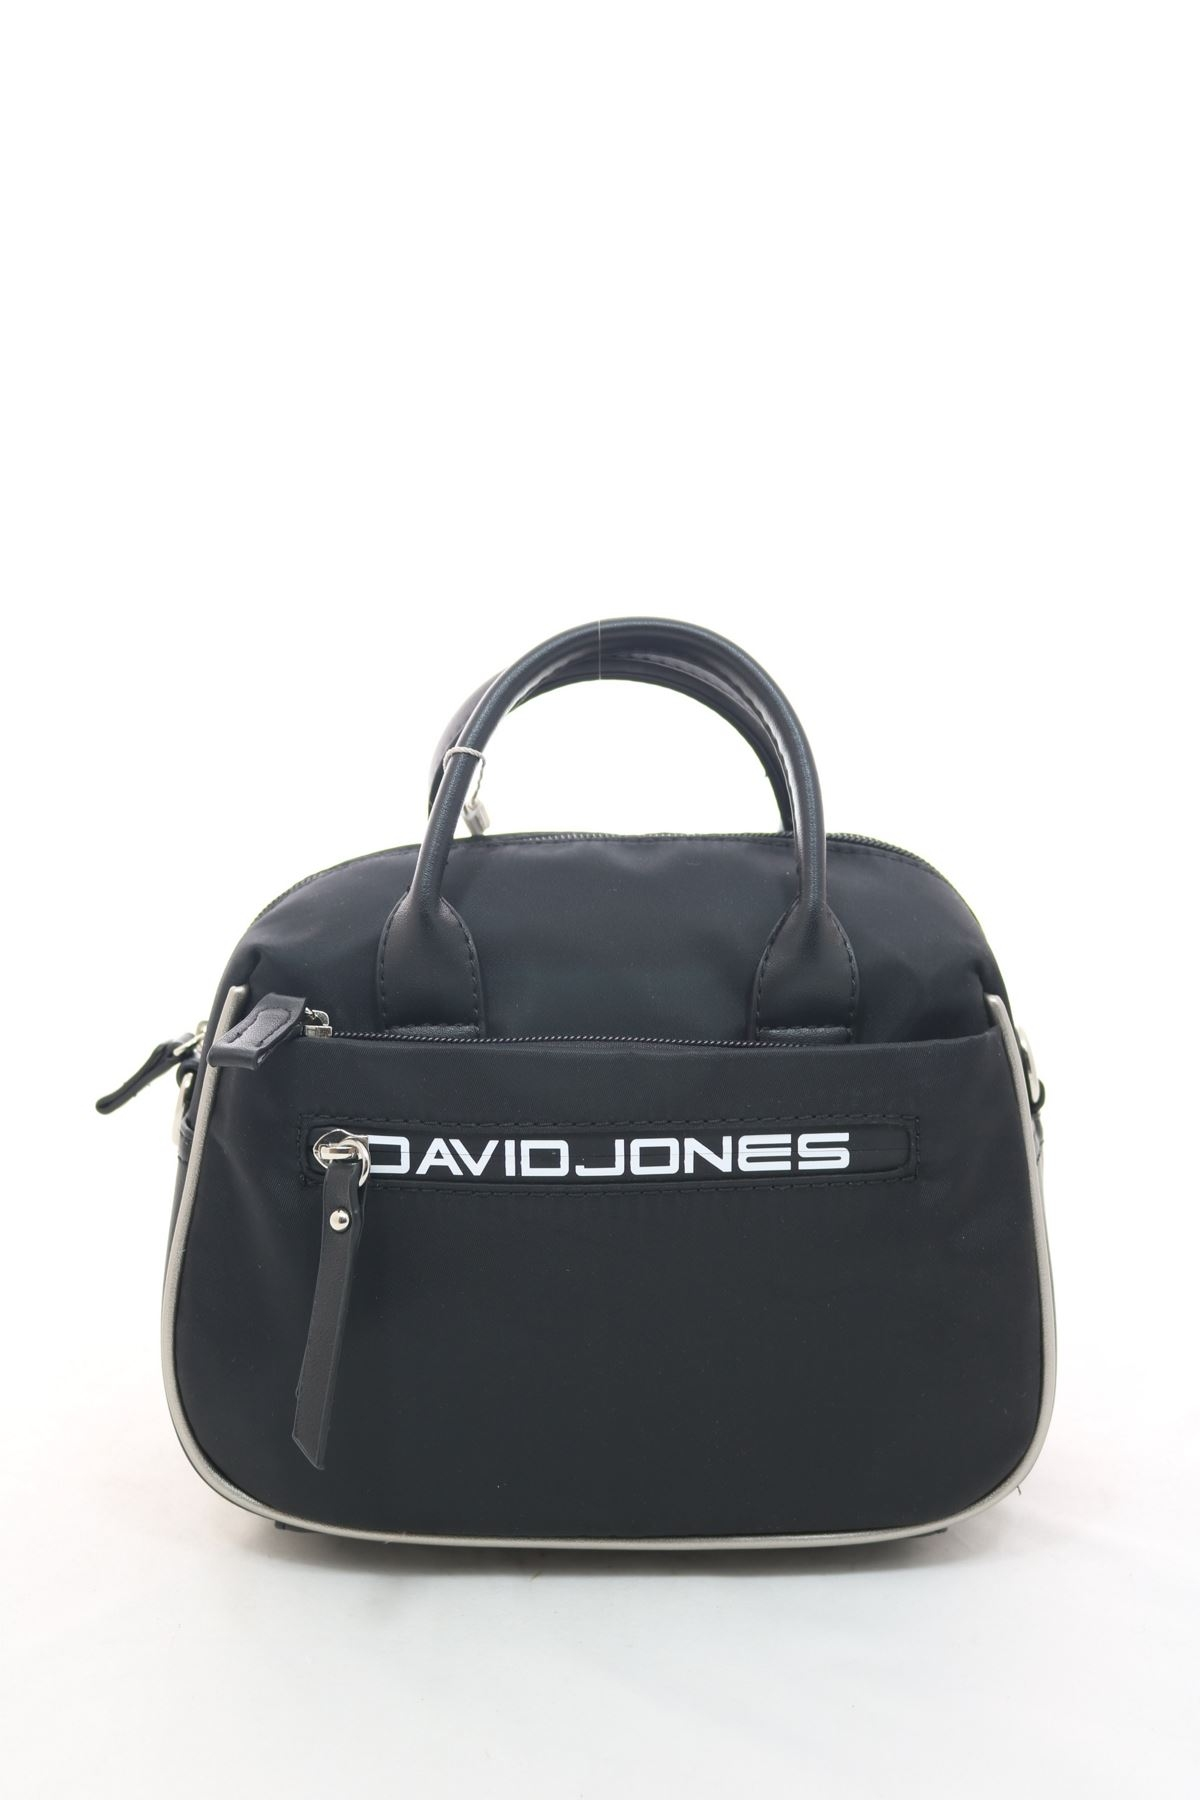 Сумка David Jones 5962-4 оптом